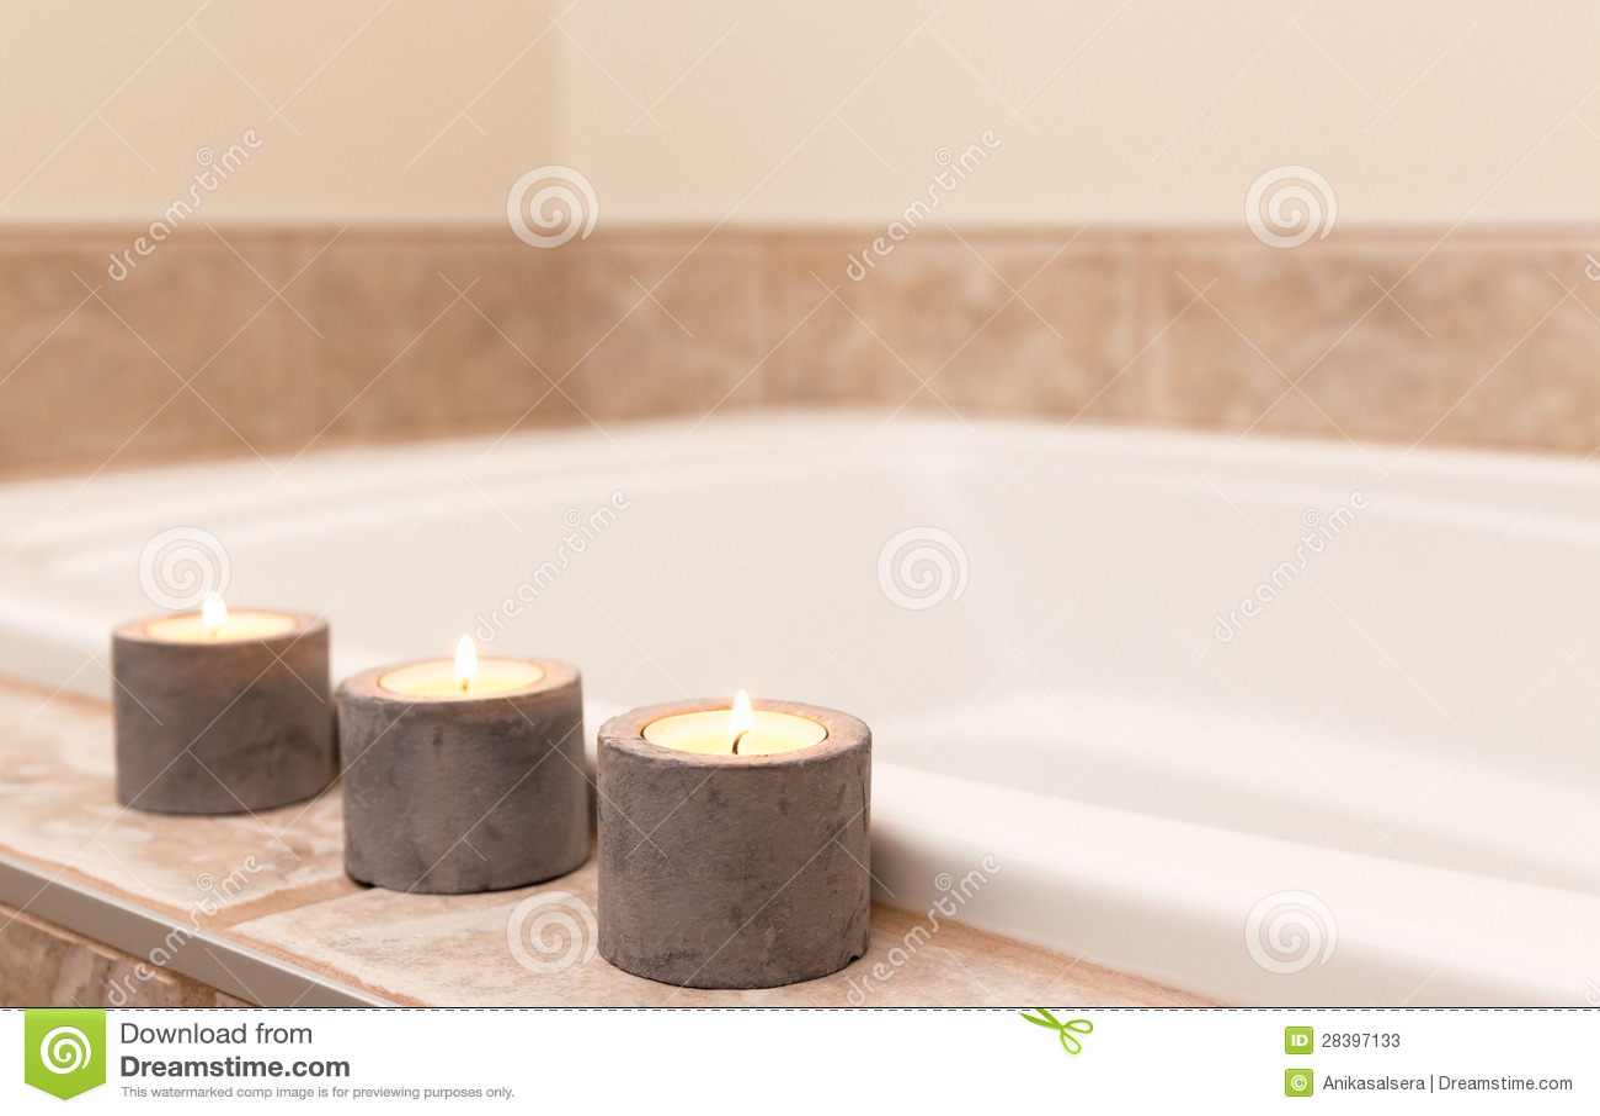 Three Candles Decorating Bathroom Stock Image Image Of